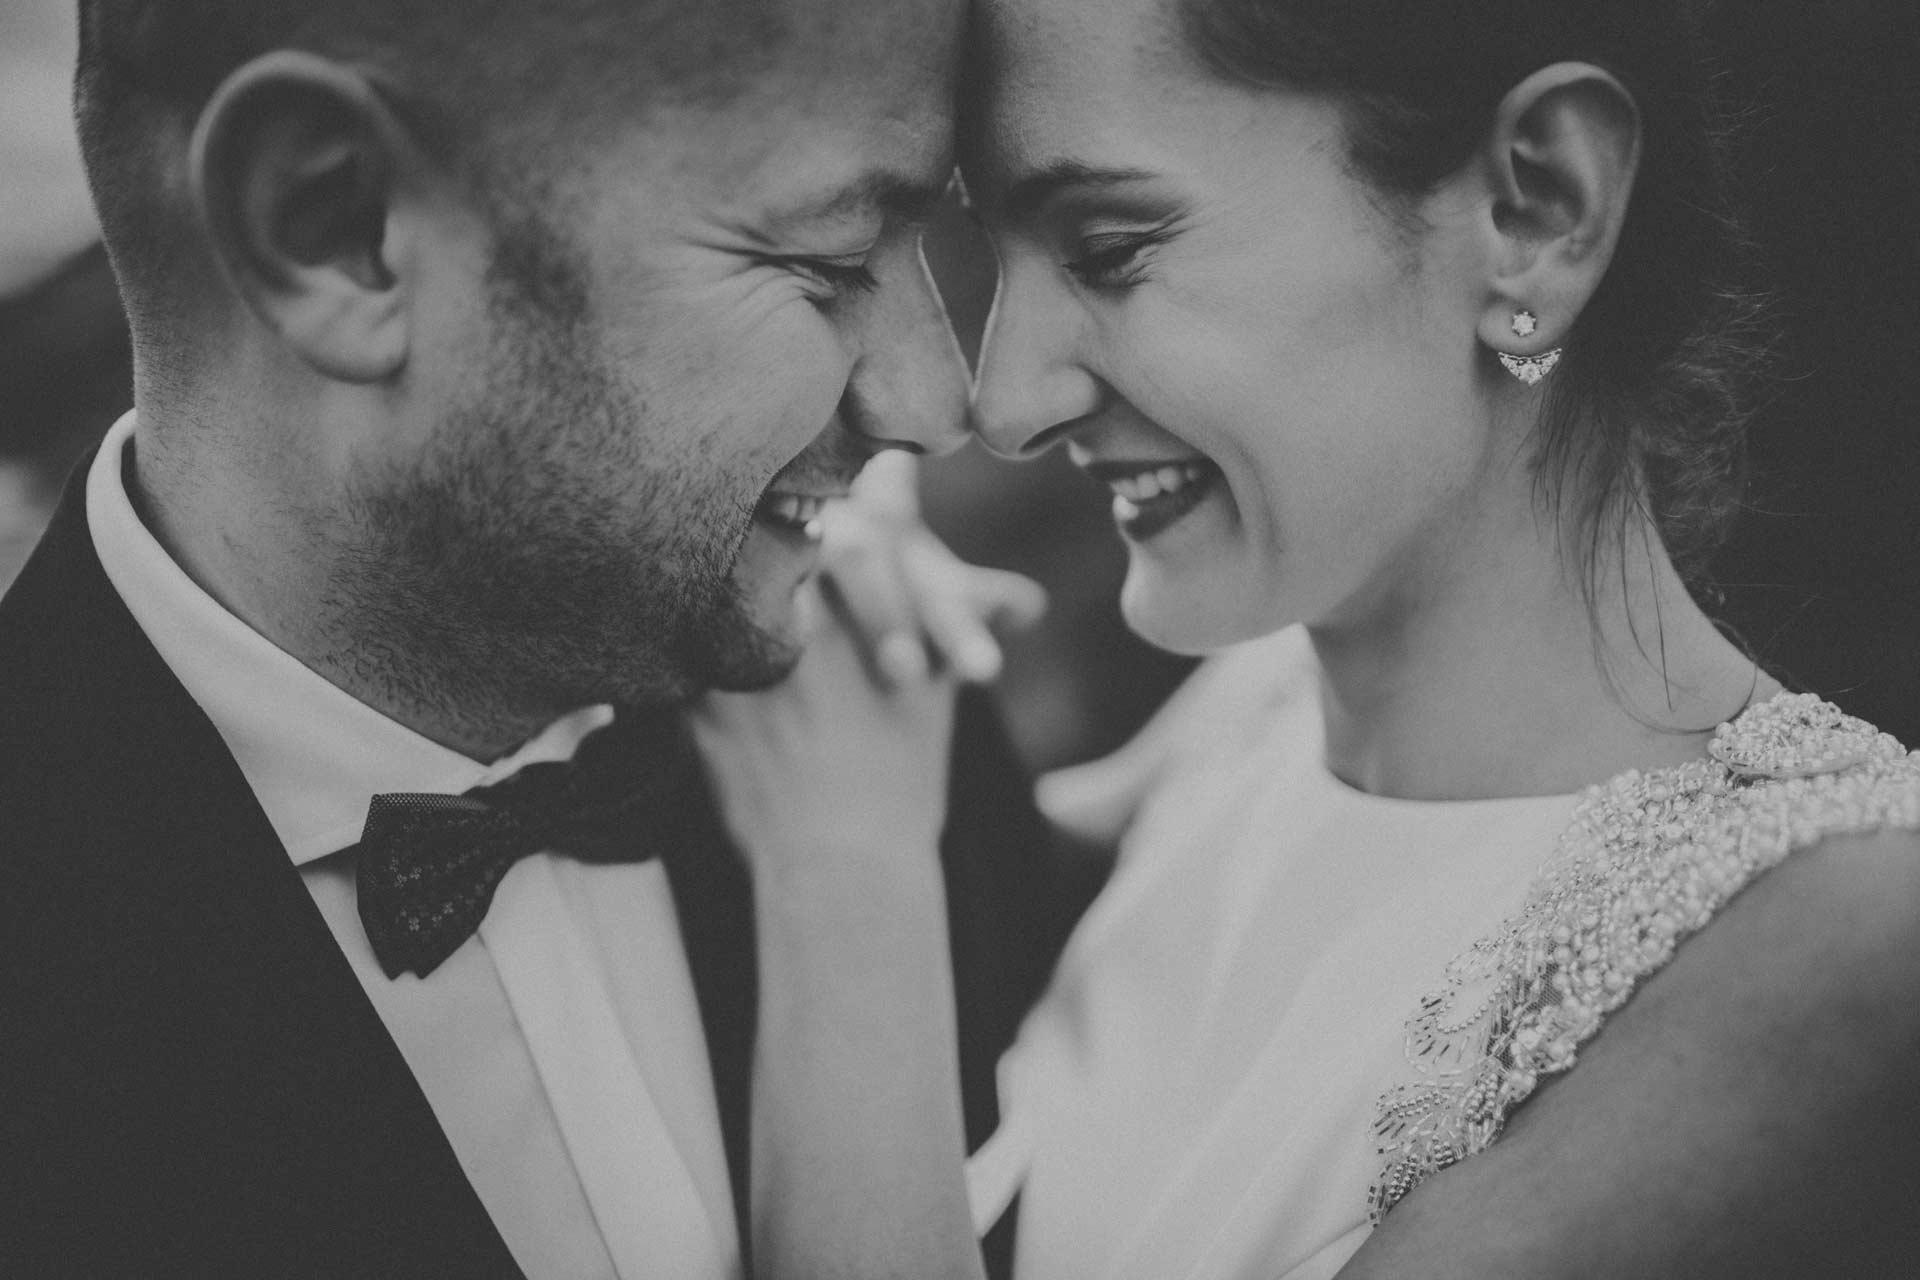 Analogue Wedding Photographer - Wedding shot exclusively on film